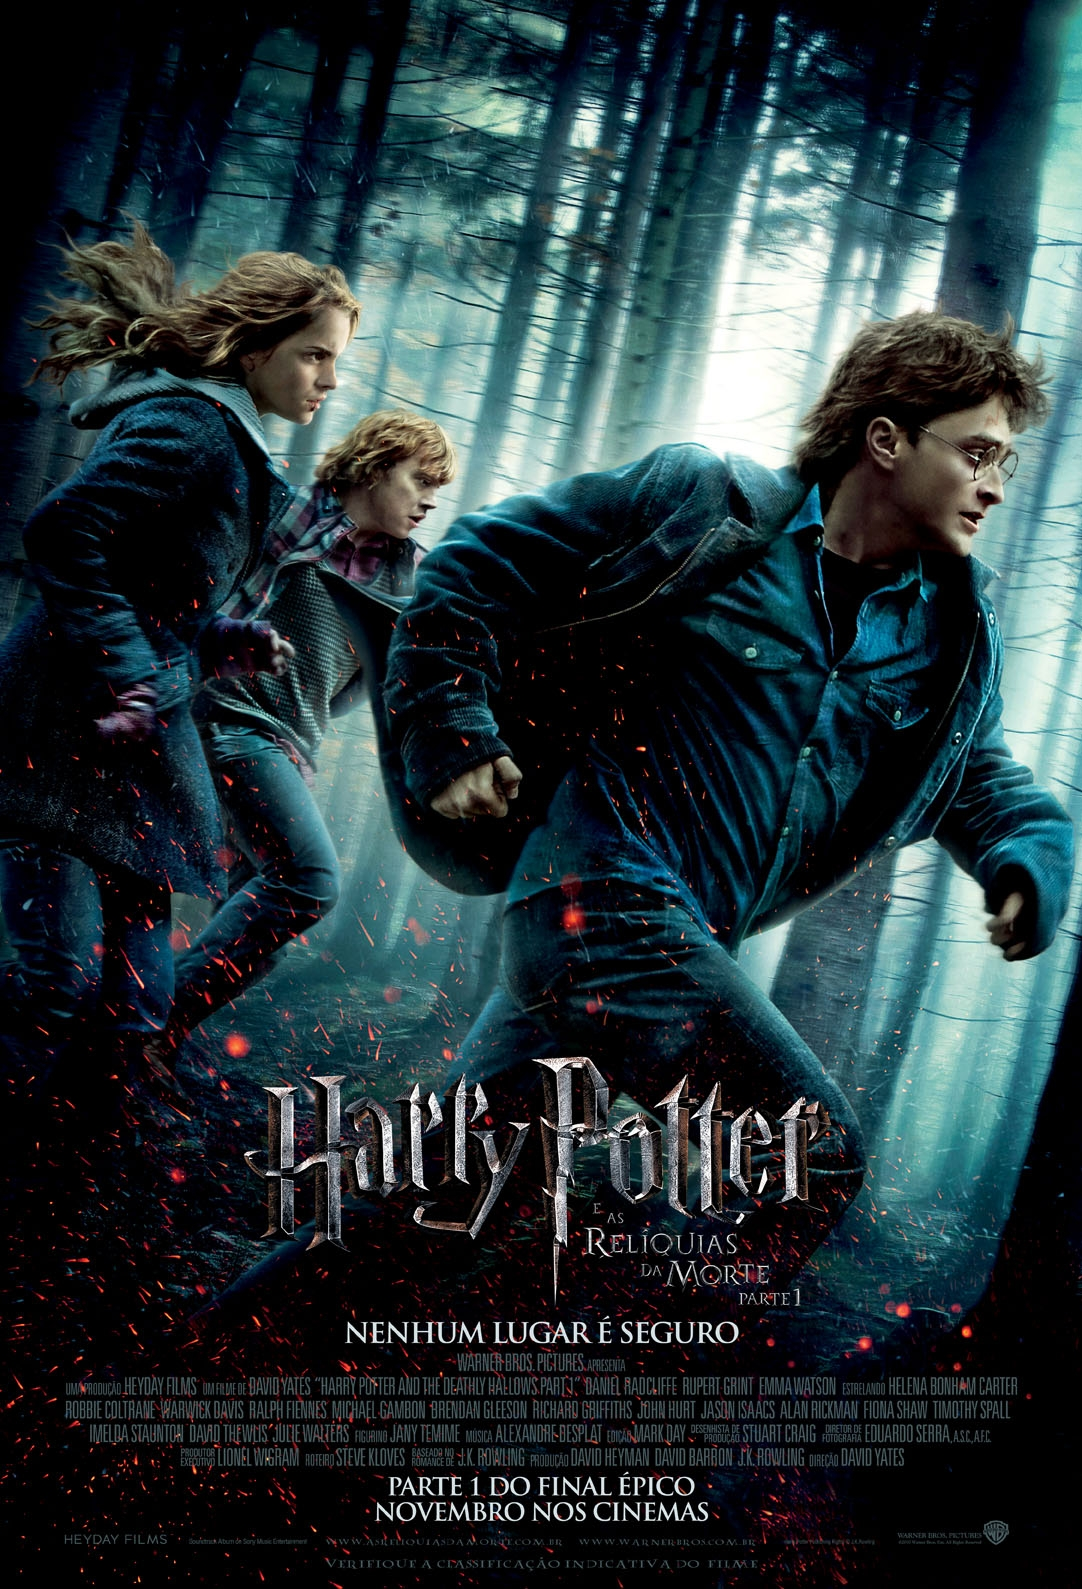 http://2.bp.blogspot.com/_soFWkCL3CyU/TPV-hpug-AI/AAAAAAAAATE/s_FeuVT7Yzc/s1600/Harry+Potter+e+as+Rel%25C3%25ADquias+da+Morte.JPG